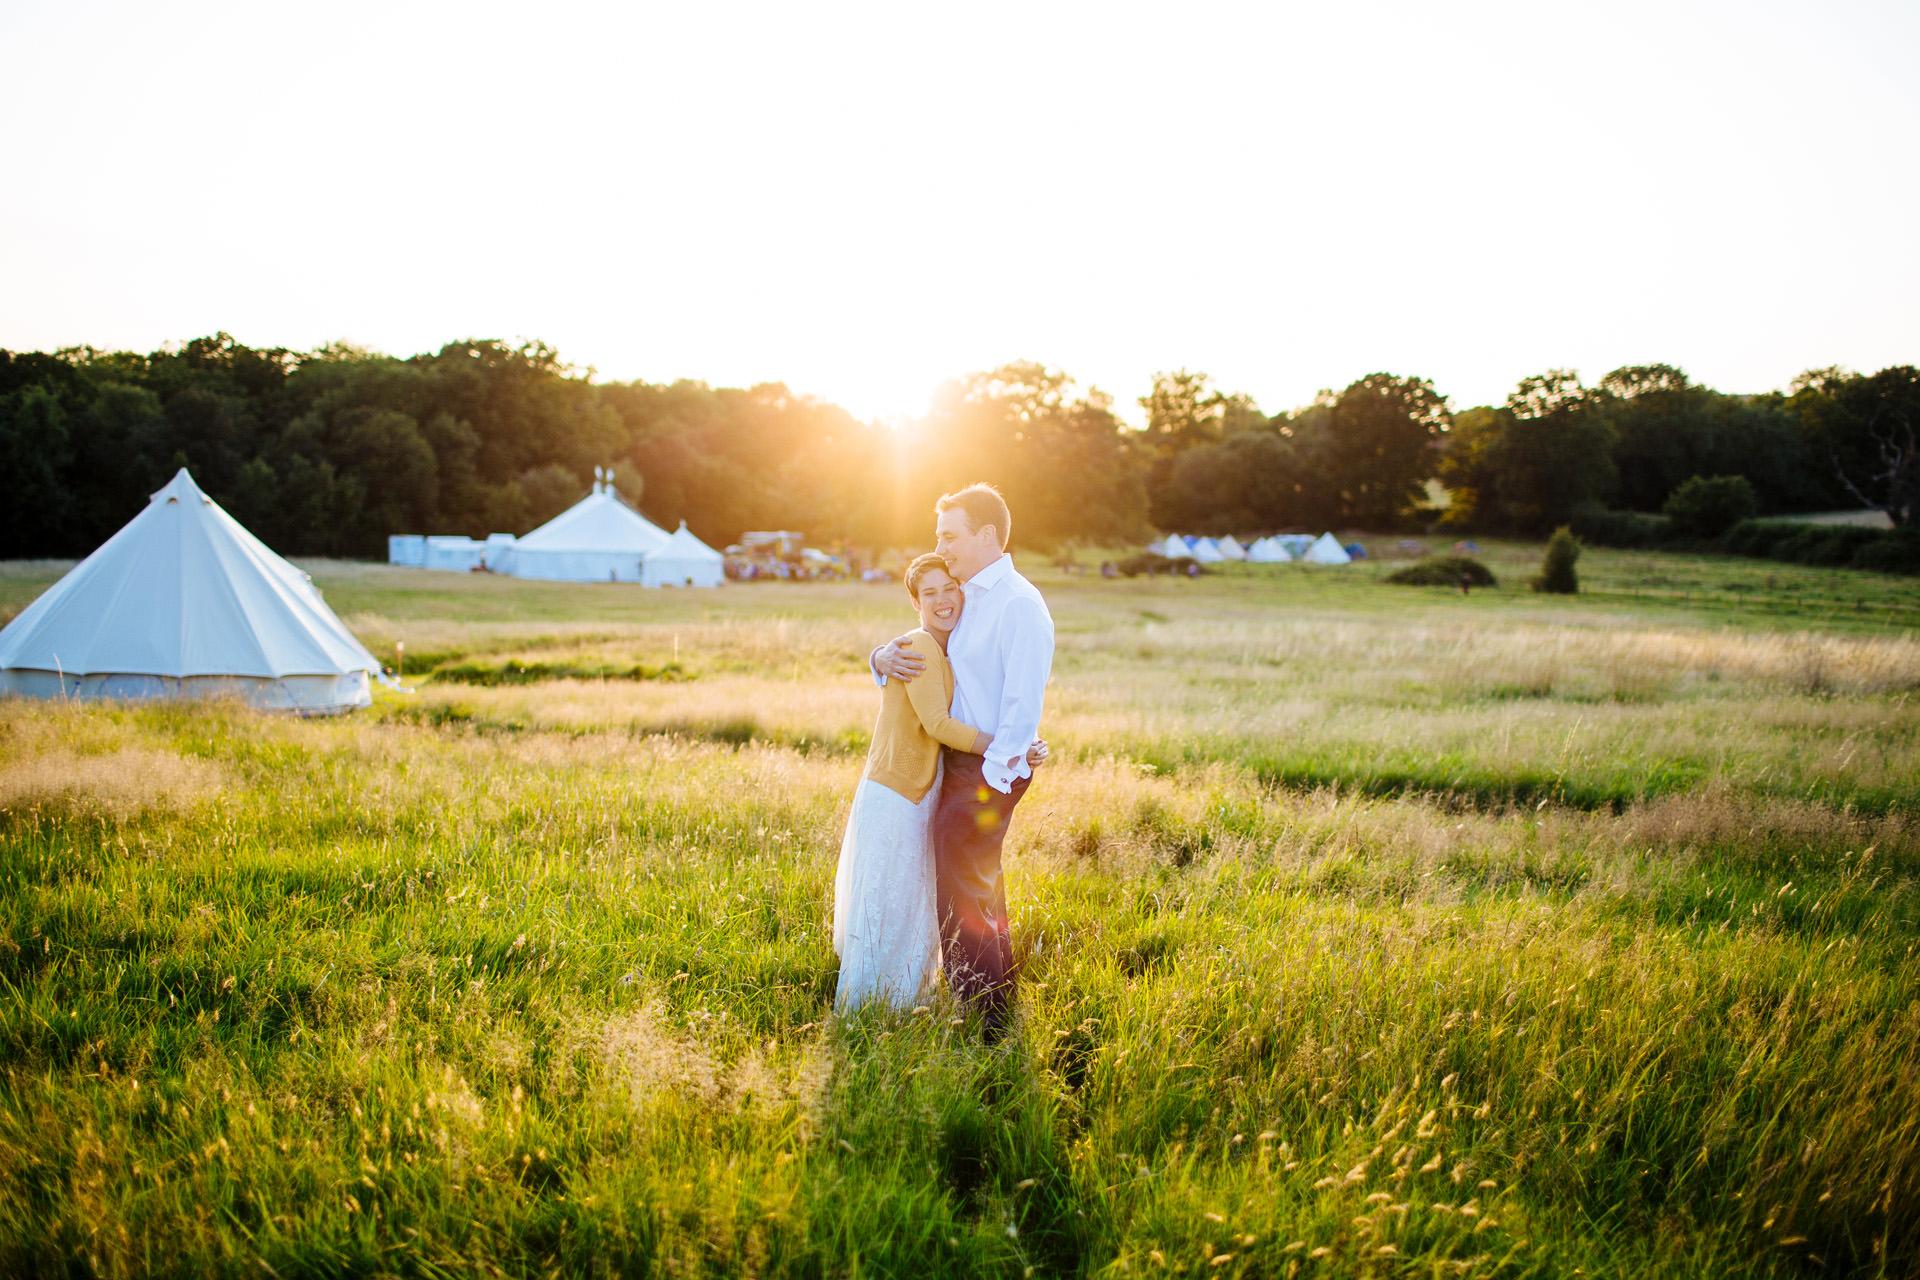 festival wedding at sunset